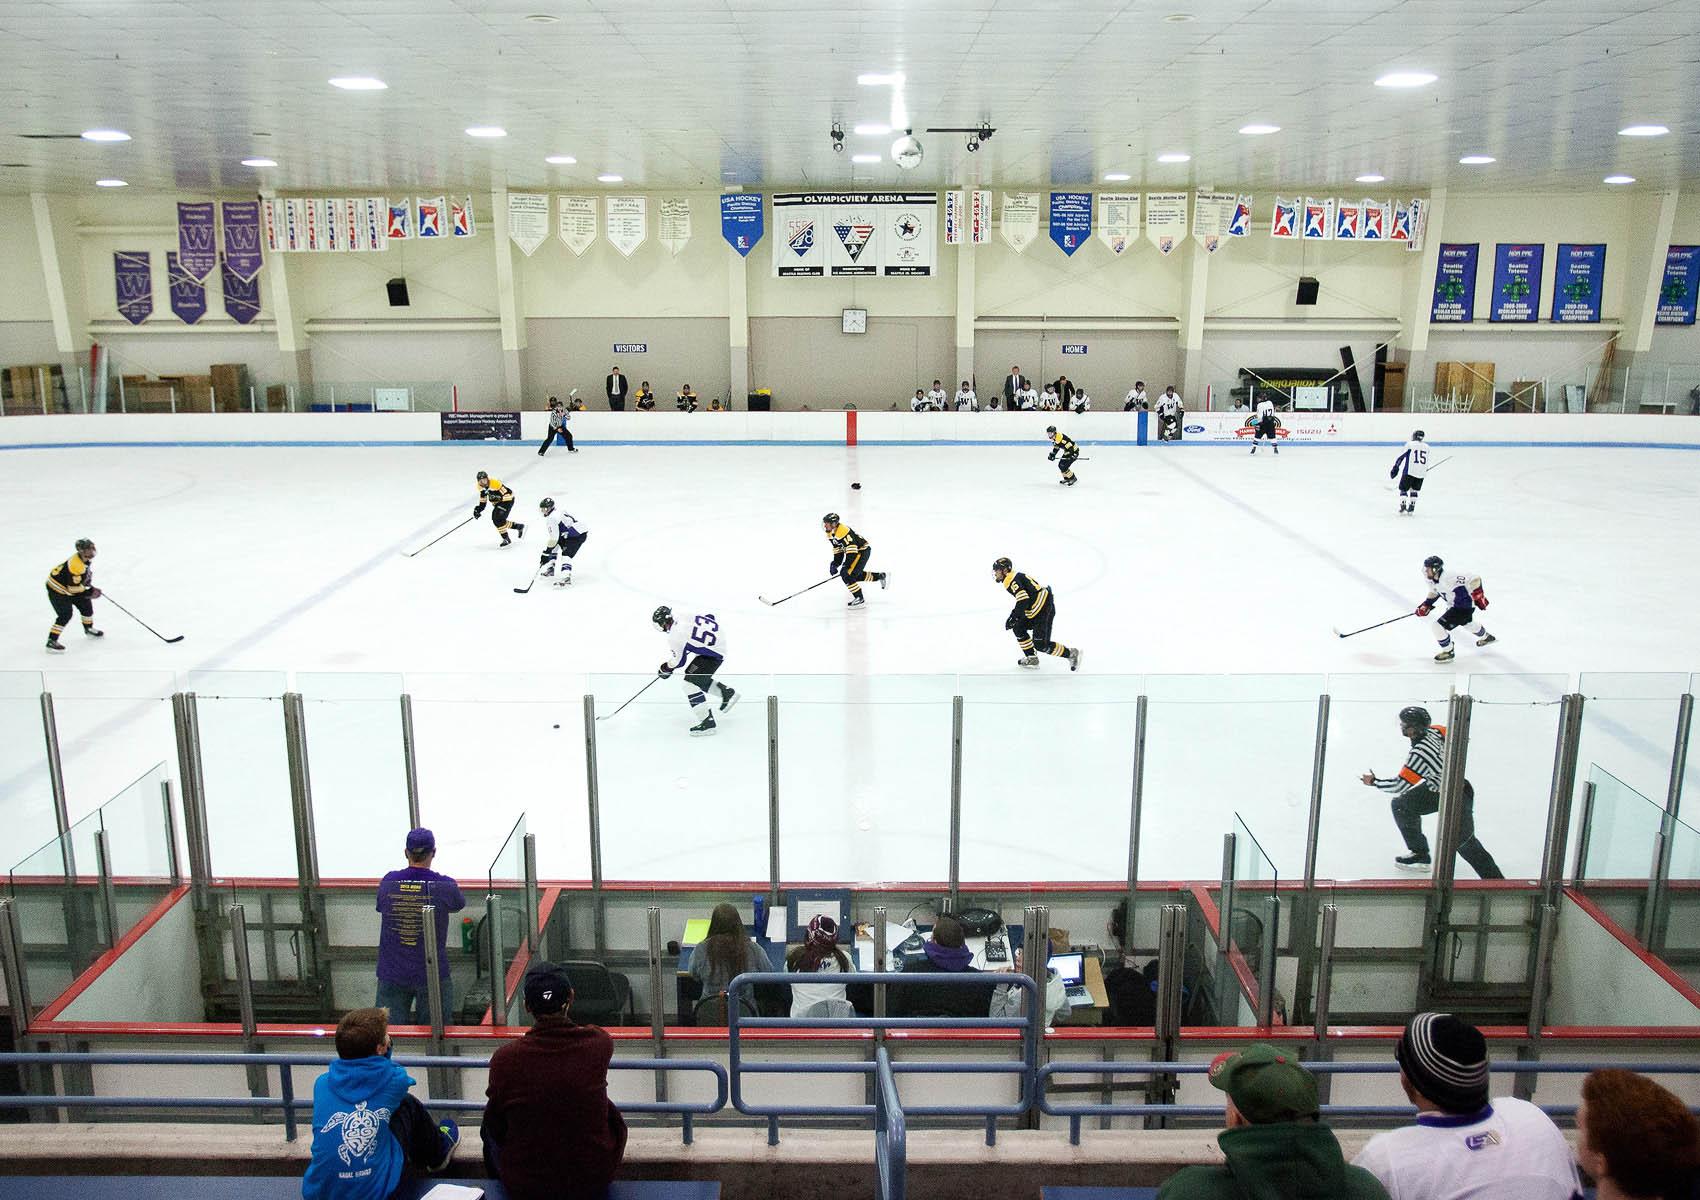 UW_Hockey_Rink